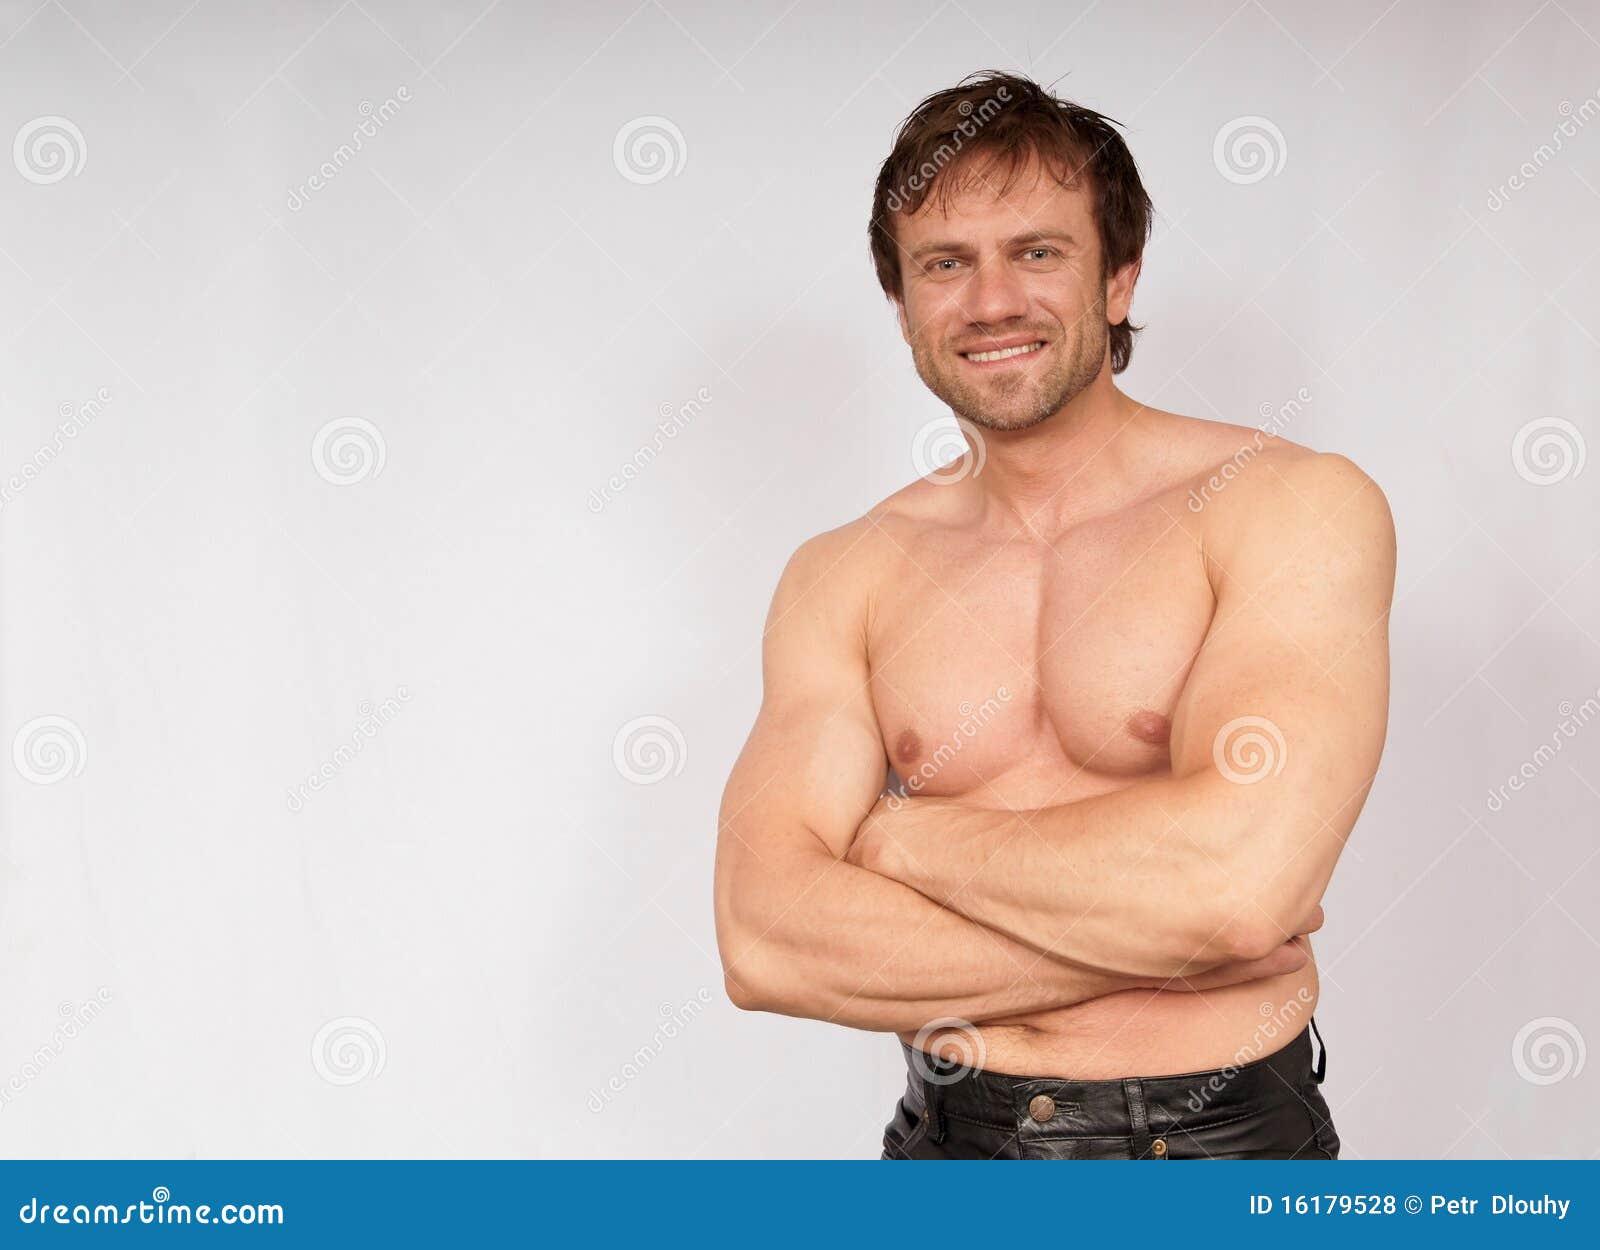 Male free Nude Photos 97